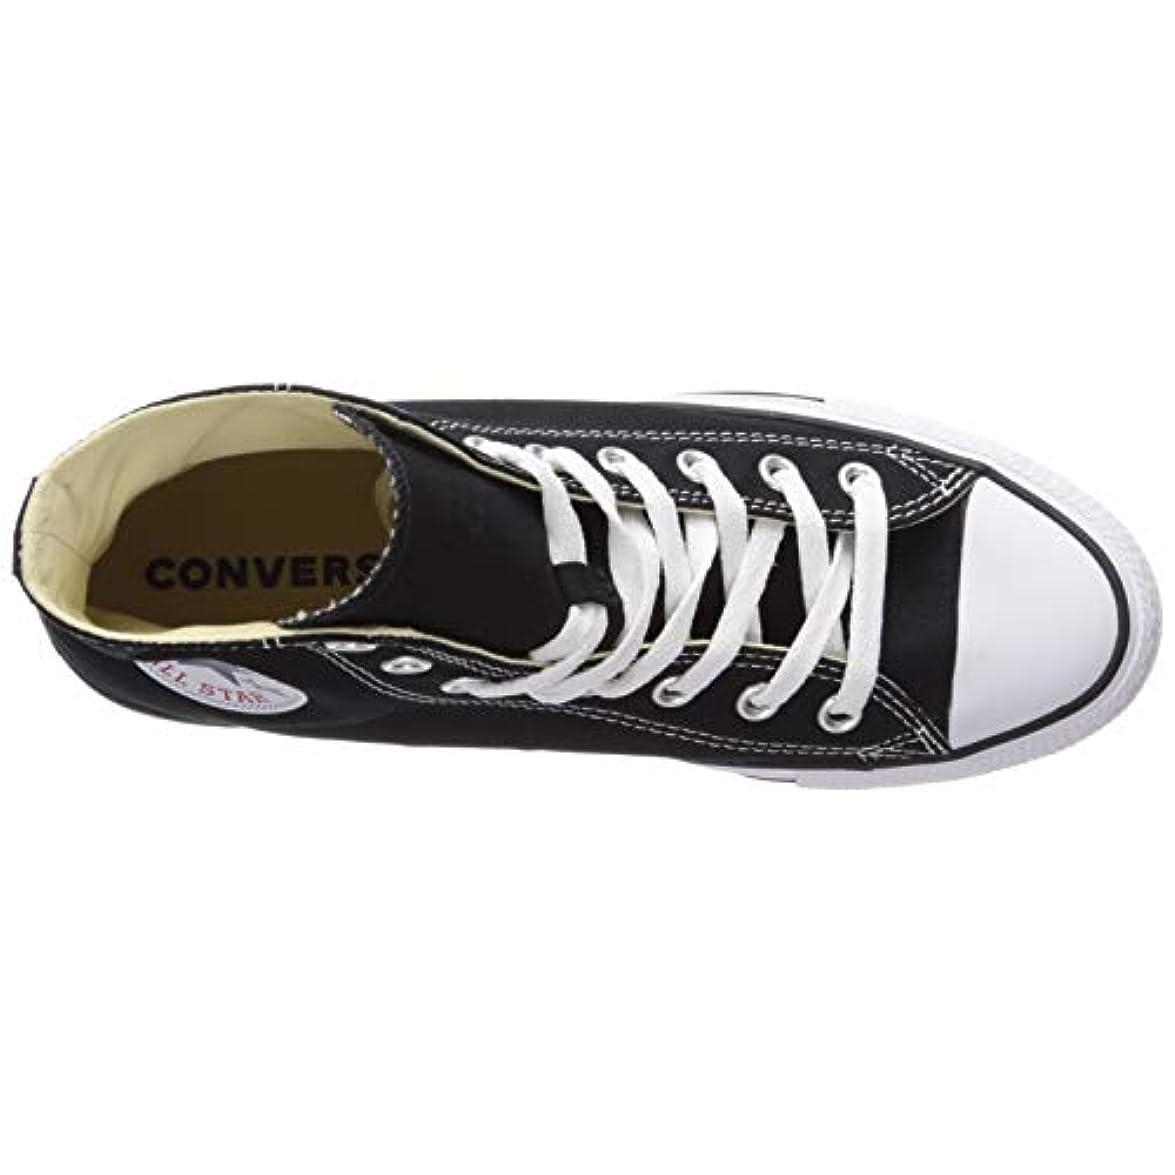 Adulto Hi Unisex Converse Sneaker Ctas Core